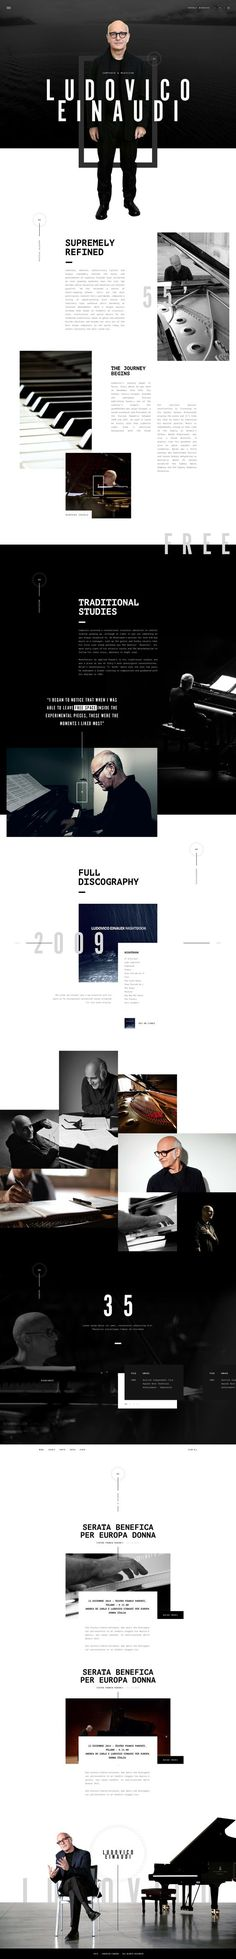 Ludovico Einaudi Web Design by Gene Ross